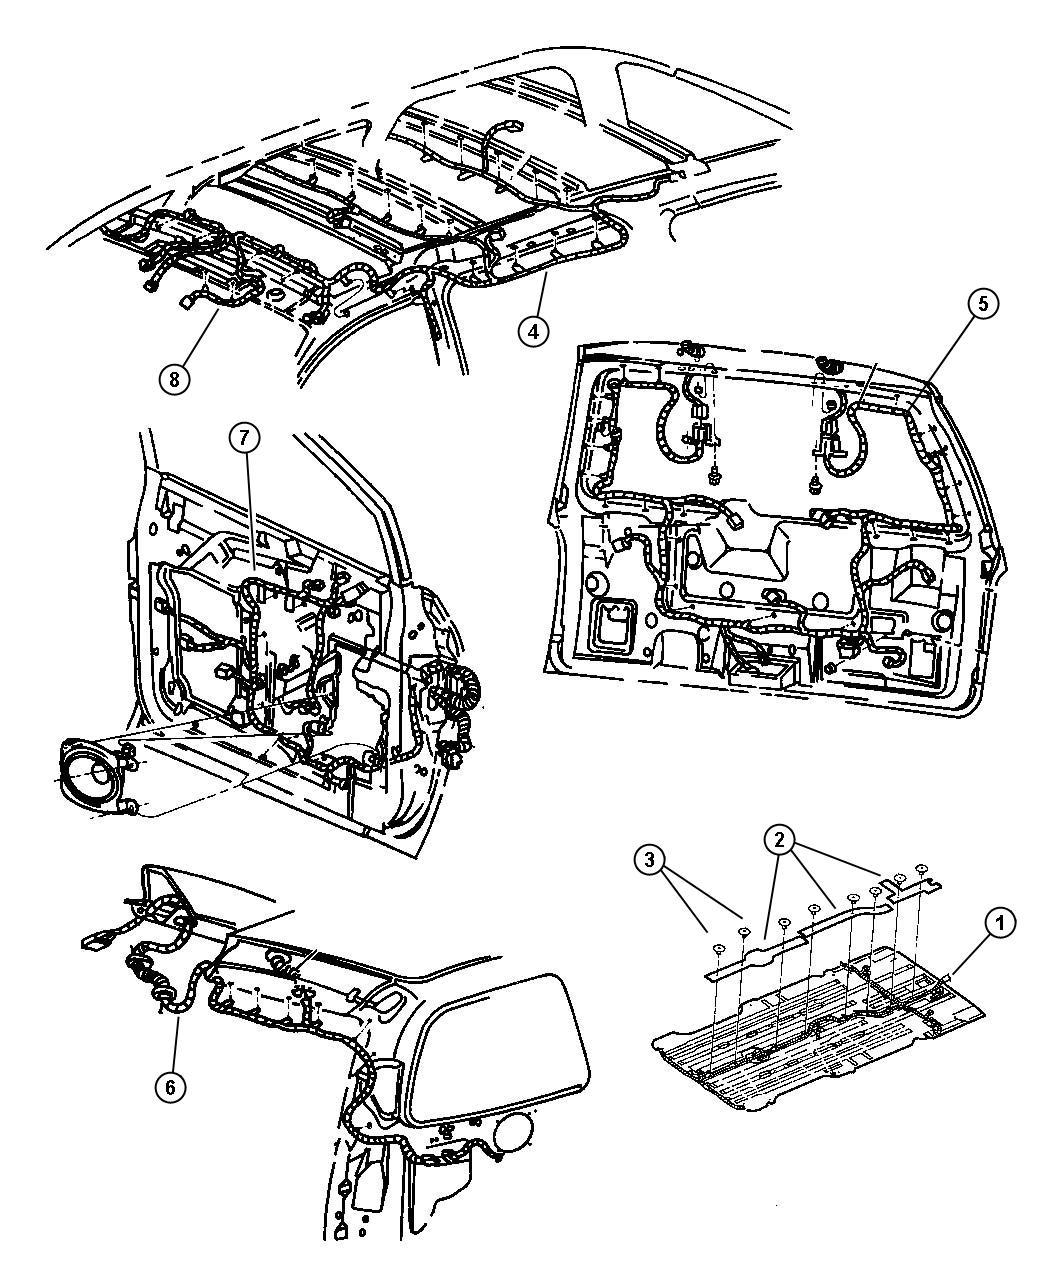 dodge grand caravan harness wiring air conditioning. Black Bedroom Furniture Sets. Home Design Ideas